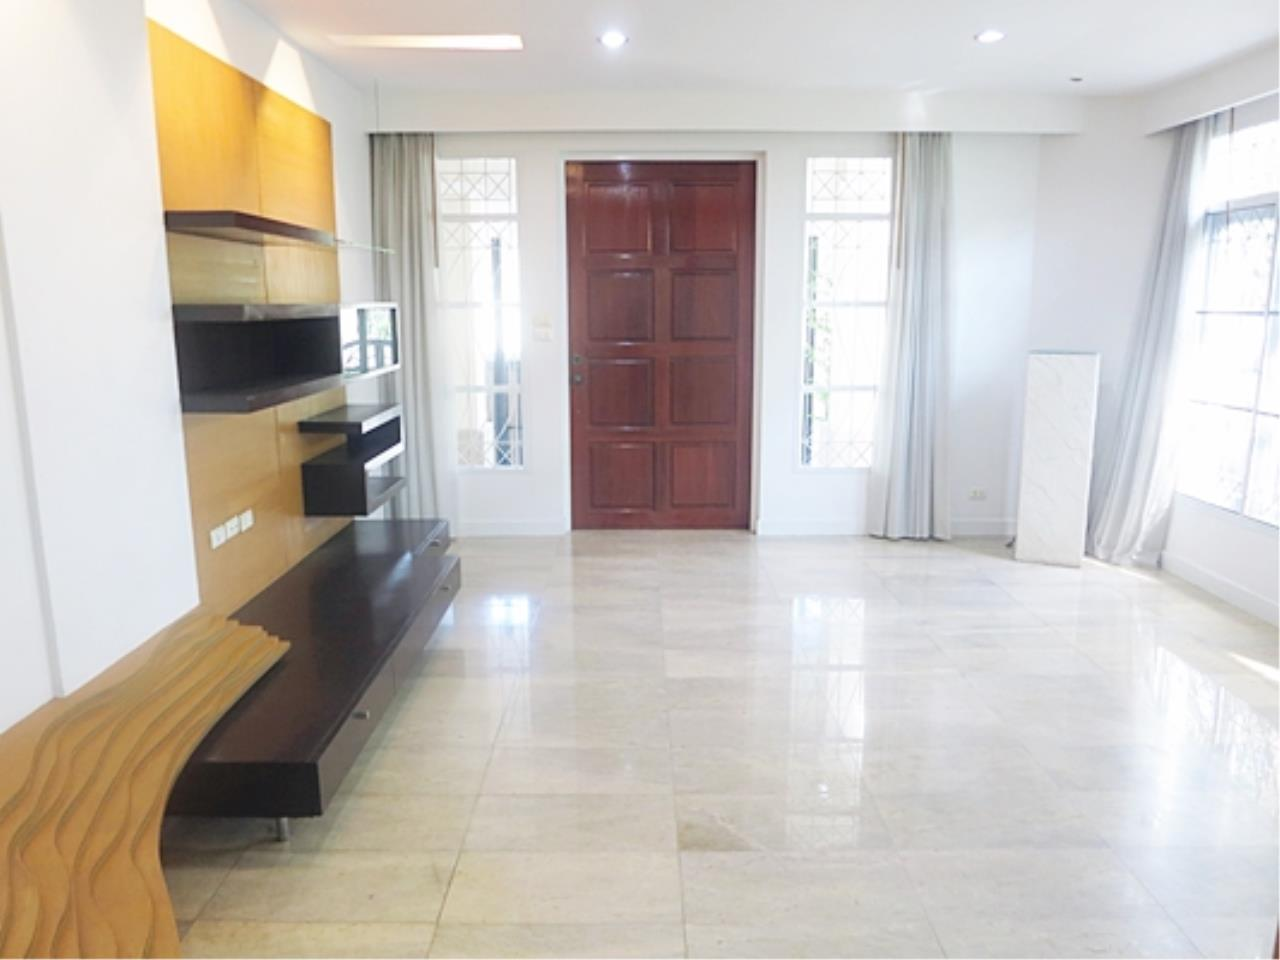 Estate Corner Agency (Samut Prakan) Agency's Single house for sale Ladprao, fully furnished. 10